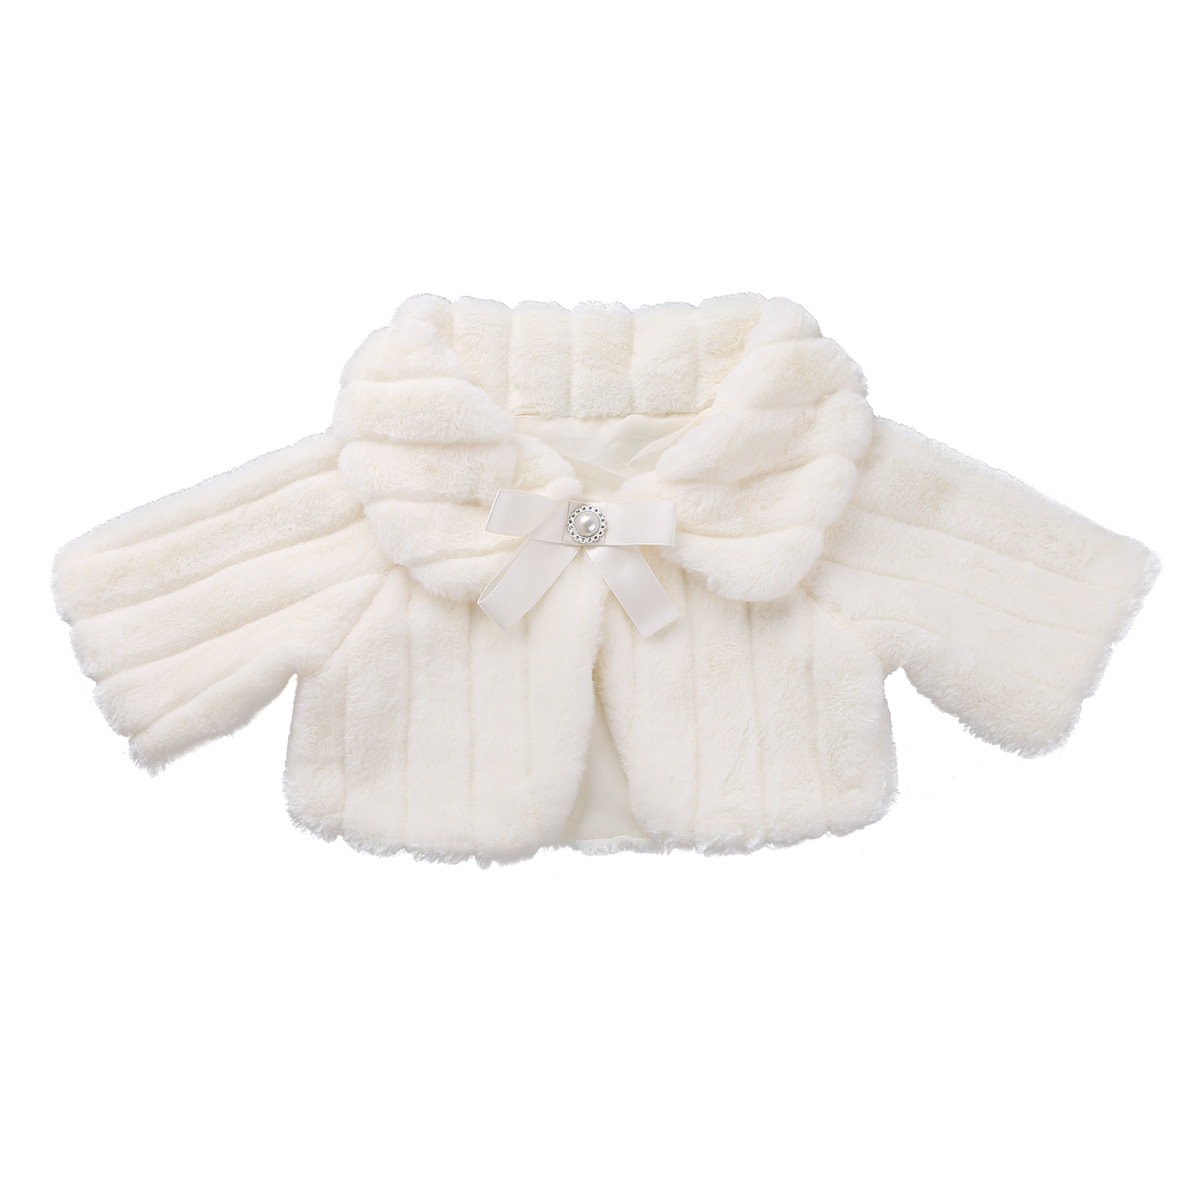 TiaoBug Girls Faux Fur Bolero Shrug Cardigan Cover up Princess Wedding Party Jacket Cloak